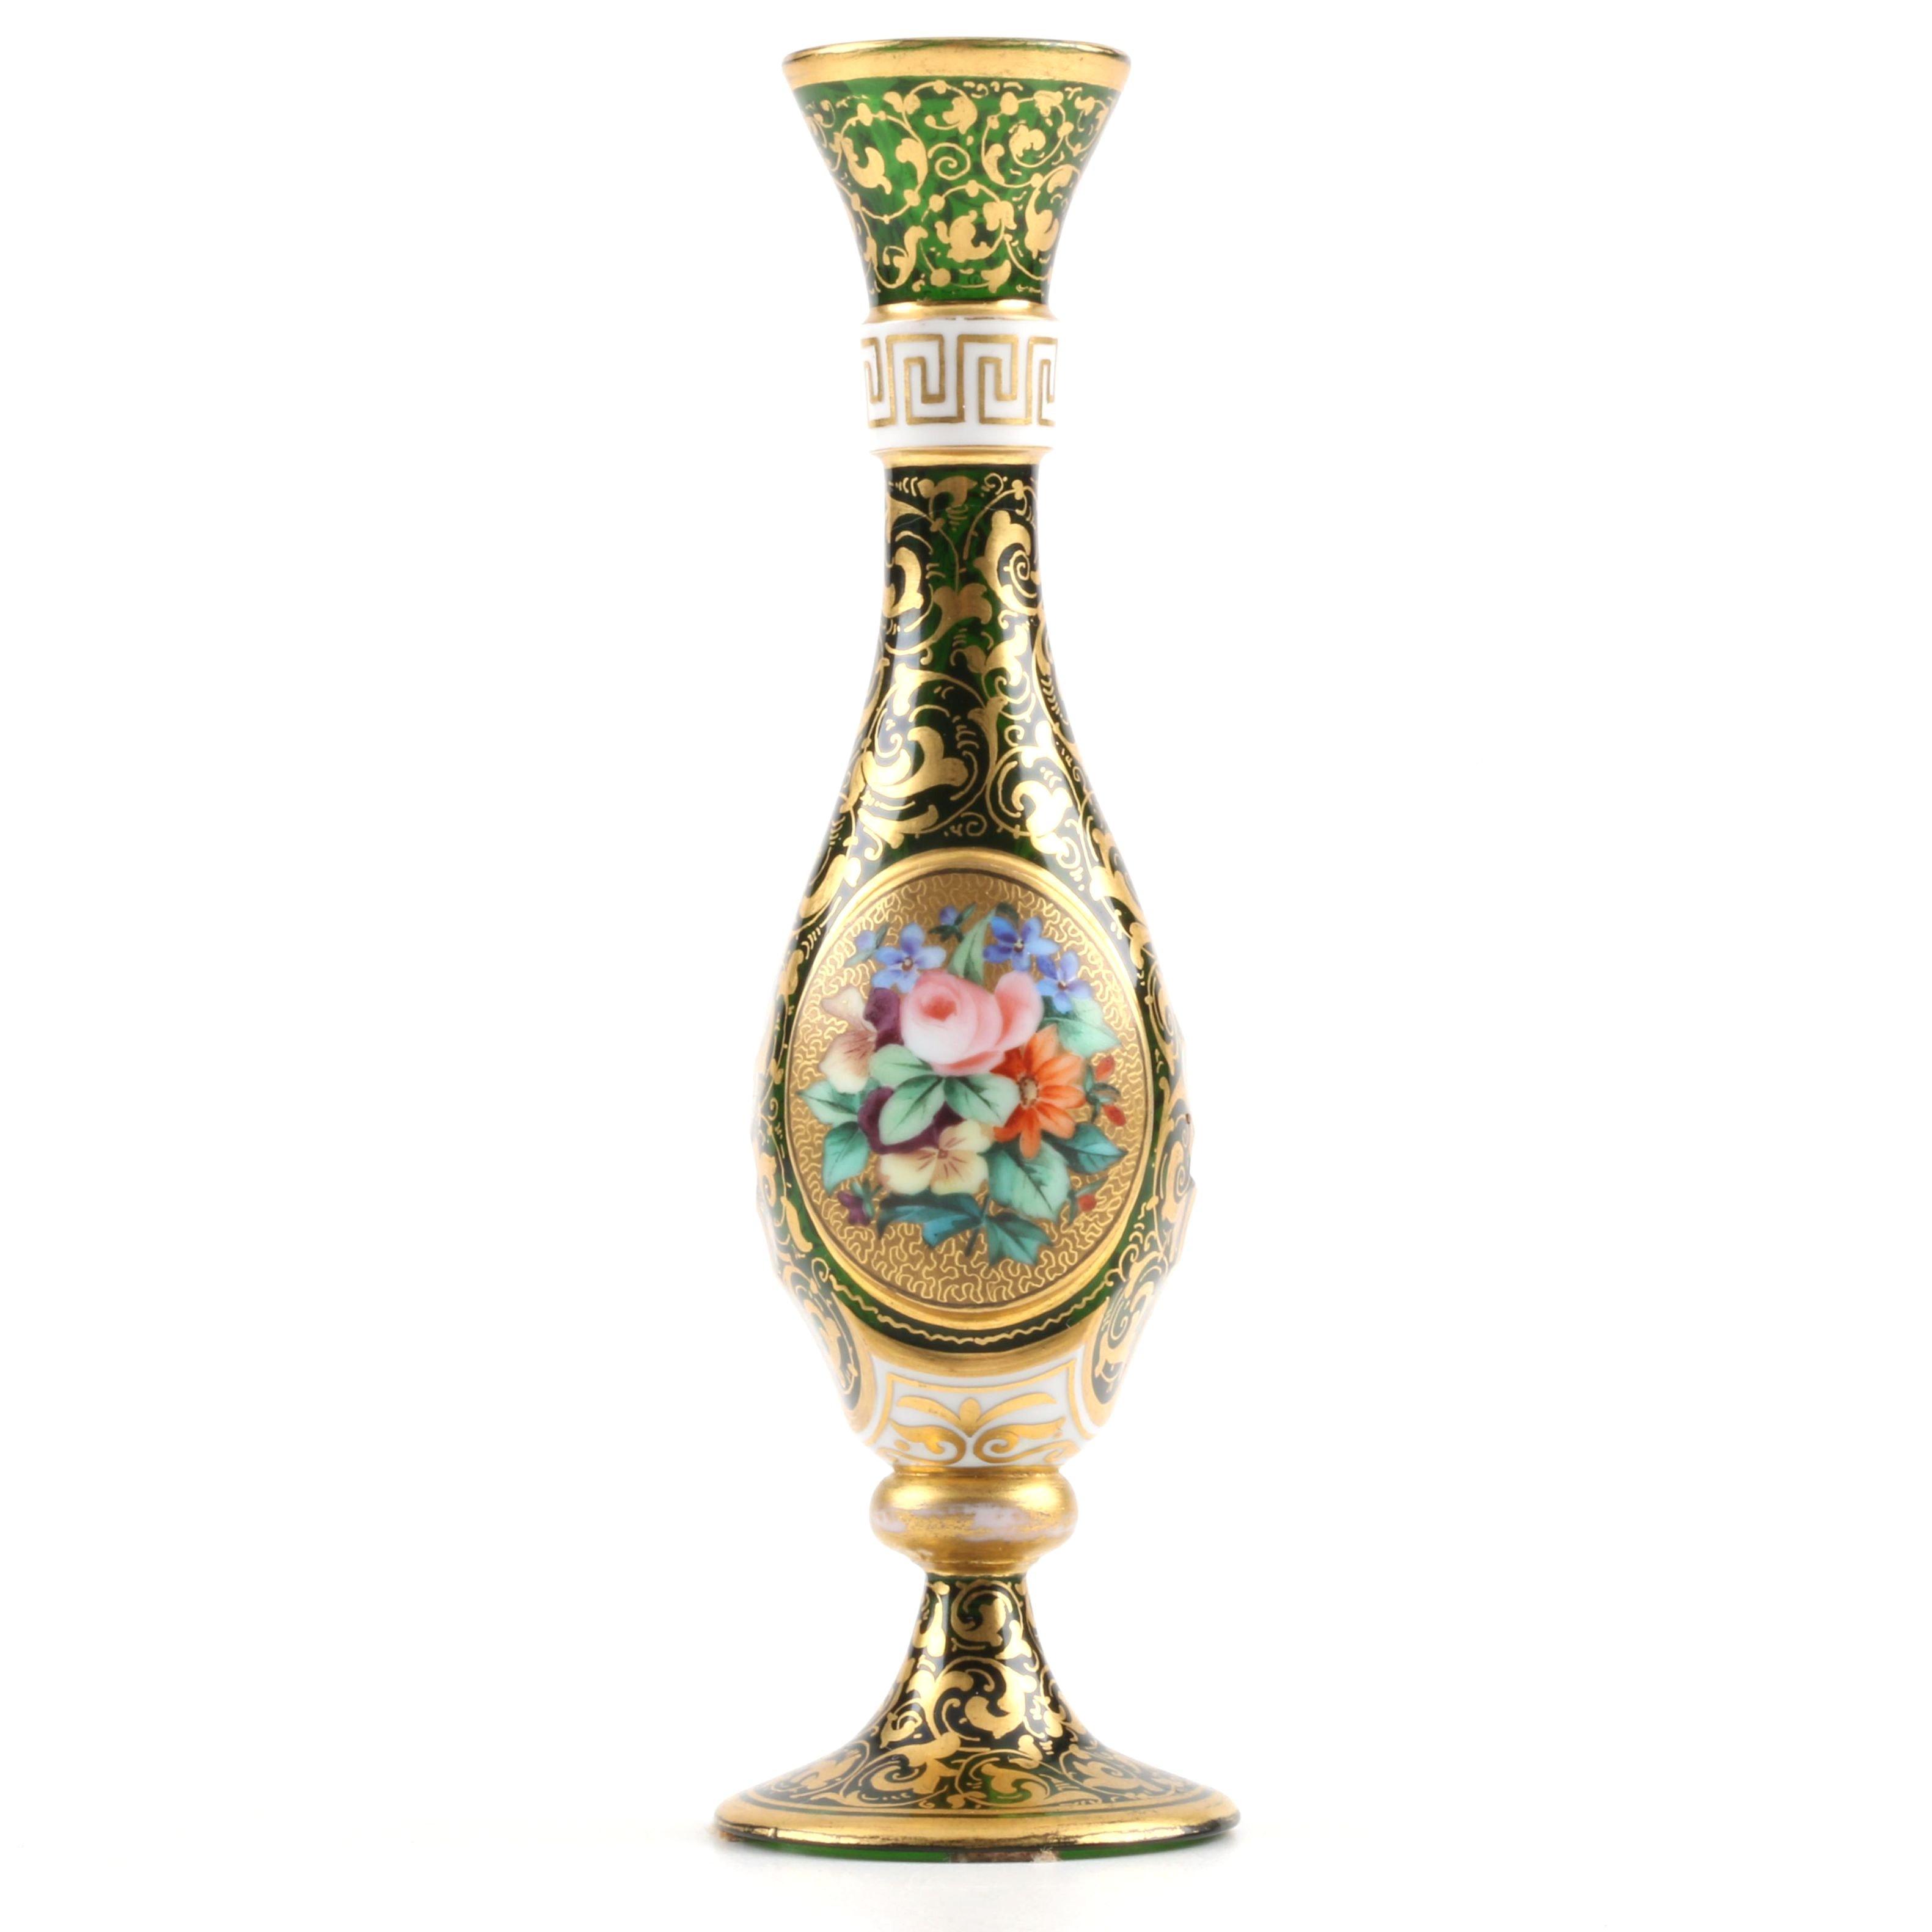 Miniature Bohemian Glass Bud Vase with Enamel Decoration